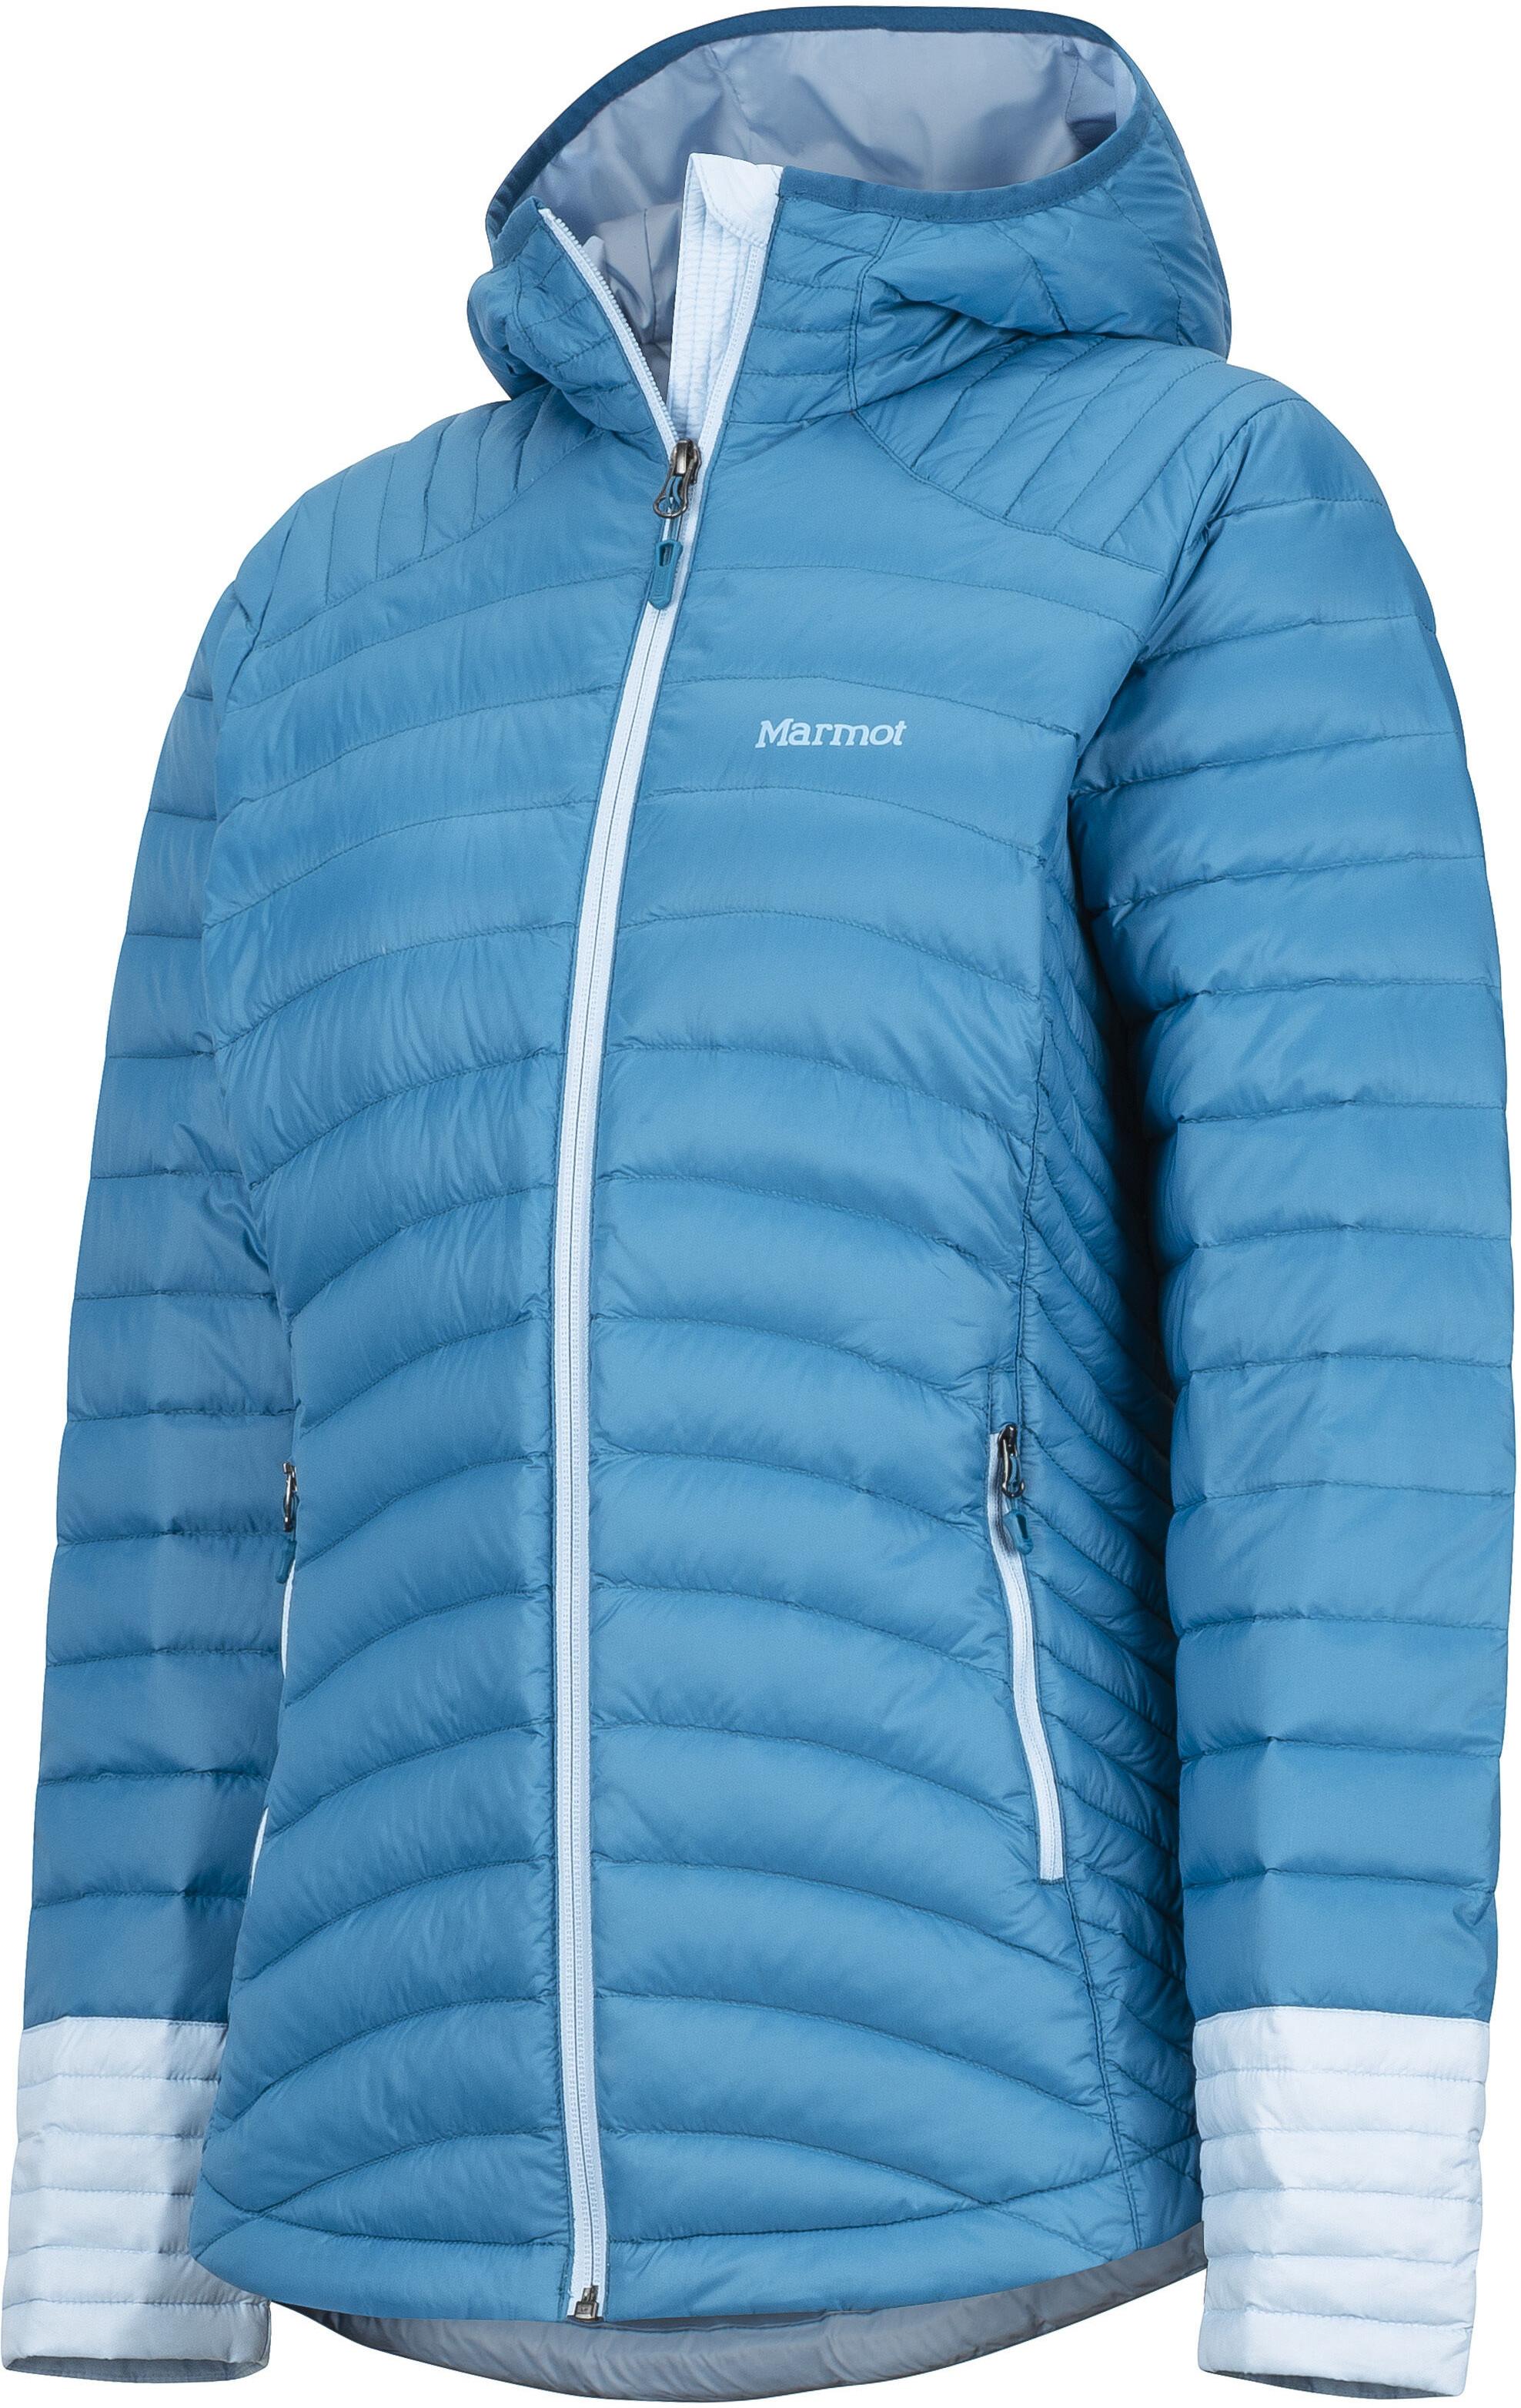 Marmot Women S Alexie Jacket: Marmot Electra Jacket Women Sapphire/Iceberg